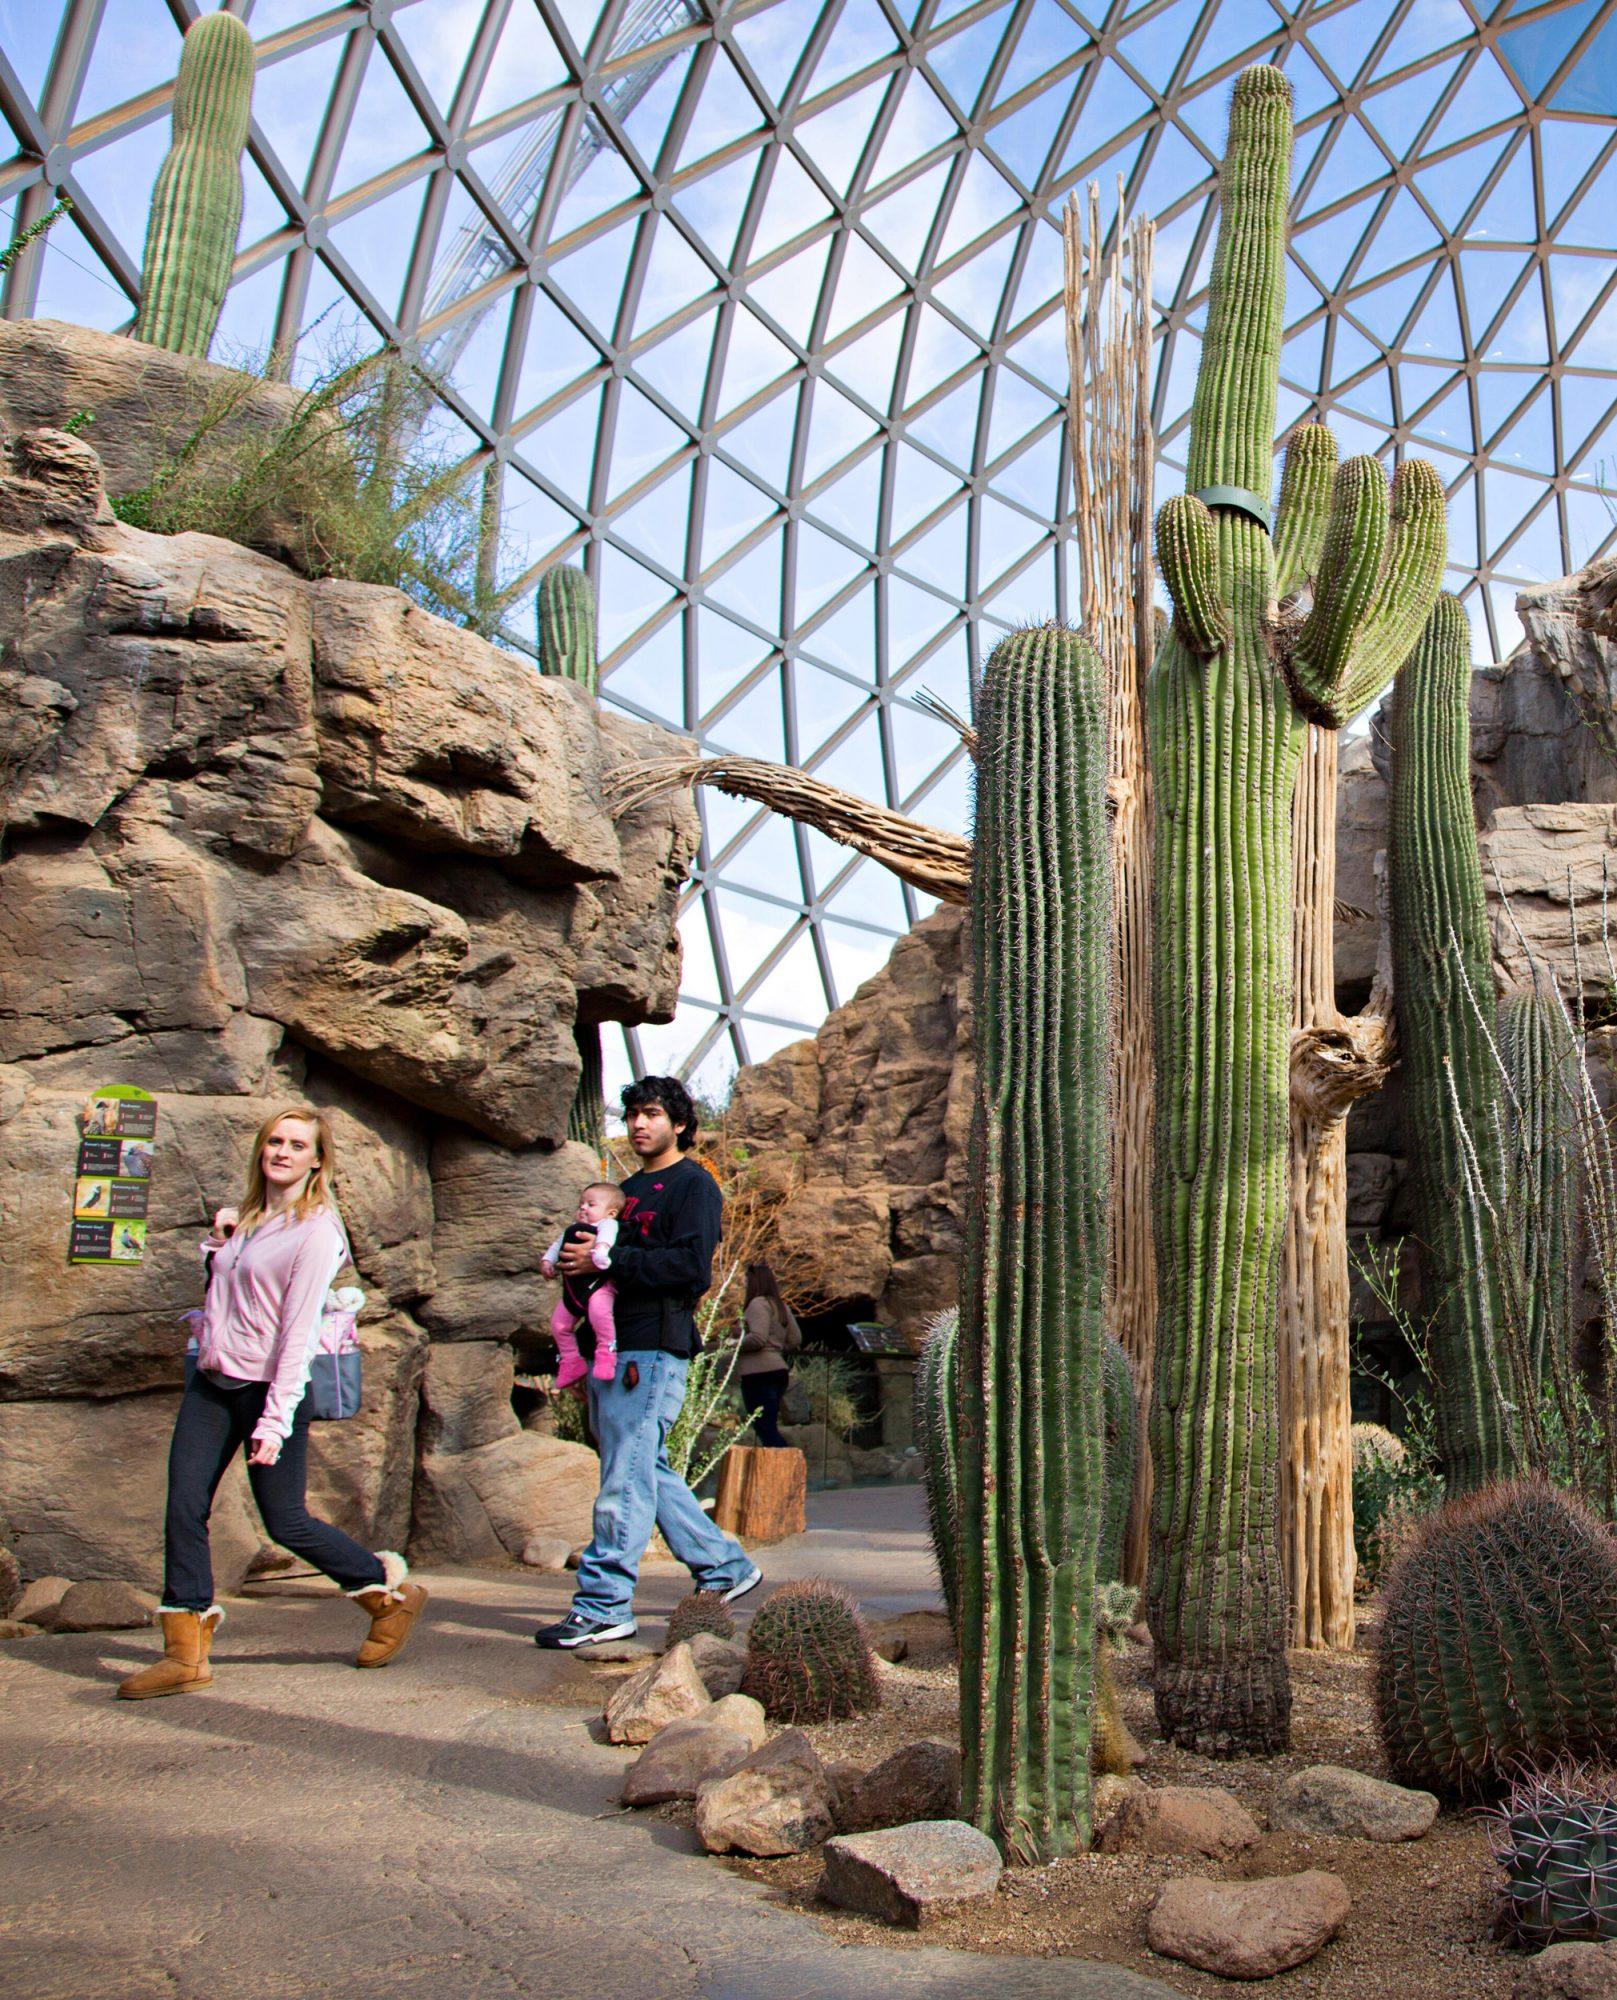 Omaha's Henry Doorly Zoo and Aquarium Desert Dome